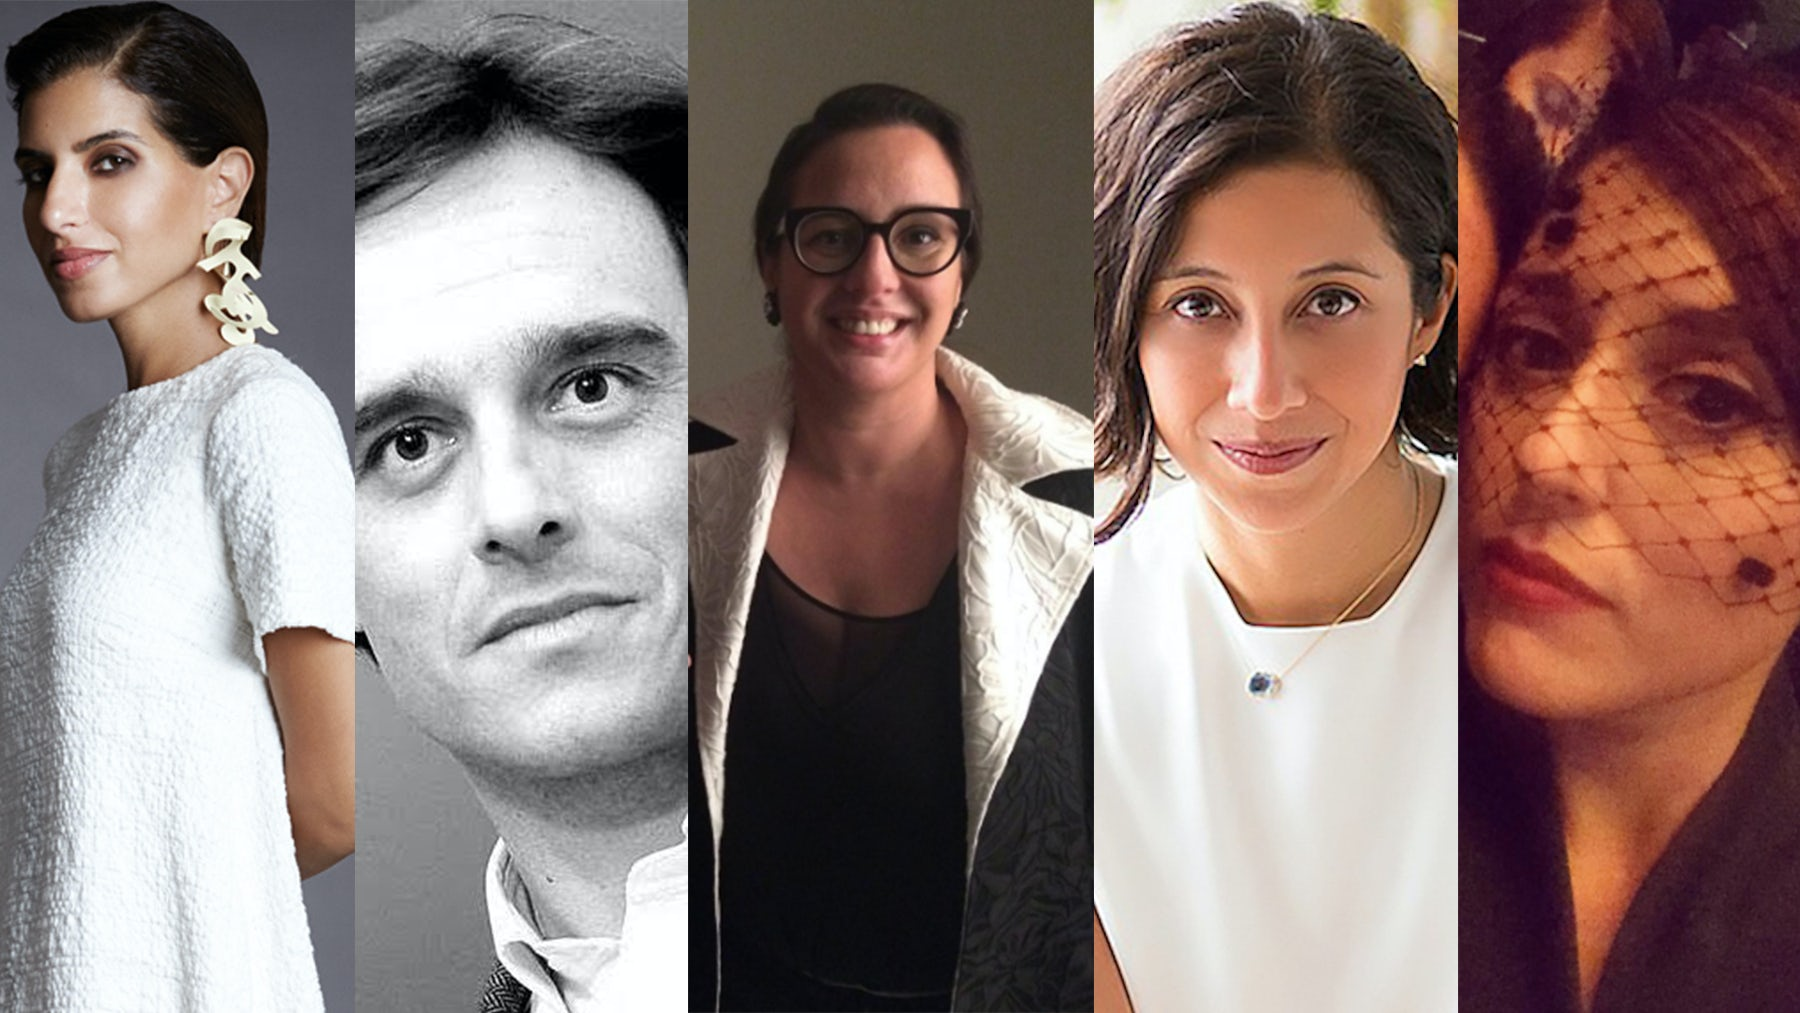 From left: Deena Aljuhani Abdulaziz, Emanuele Farneti, Silvia Rogar, Karla Martinez and Eugenia de la Torriente   Sources: Courtesty, Instagram